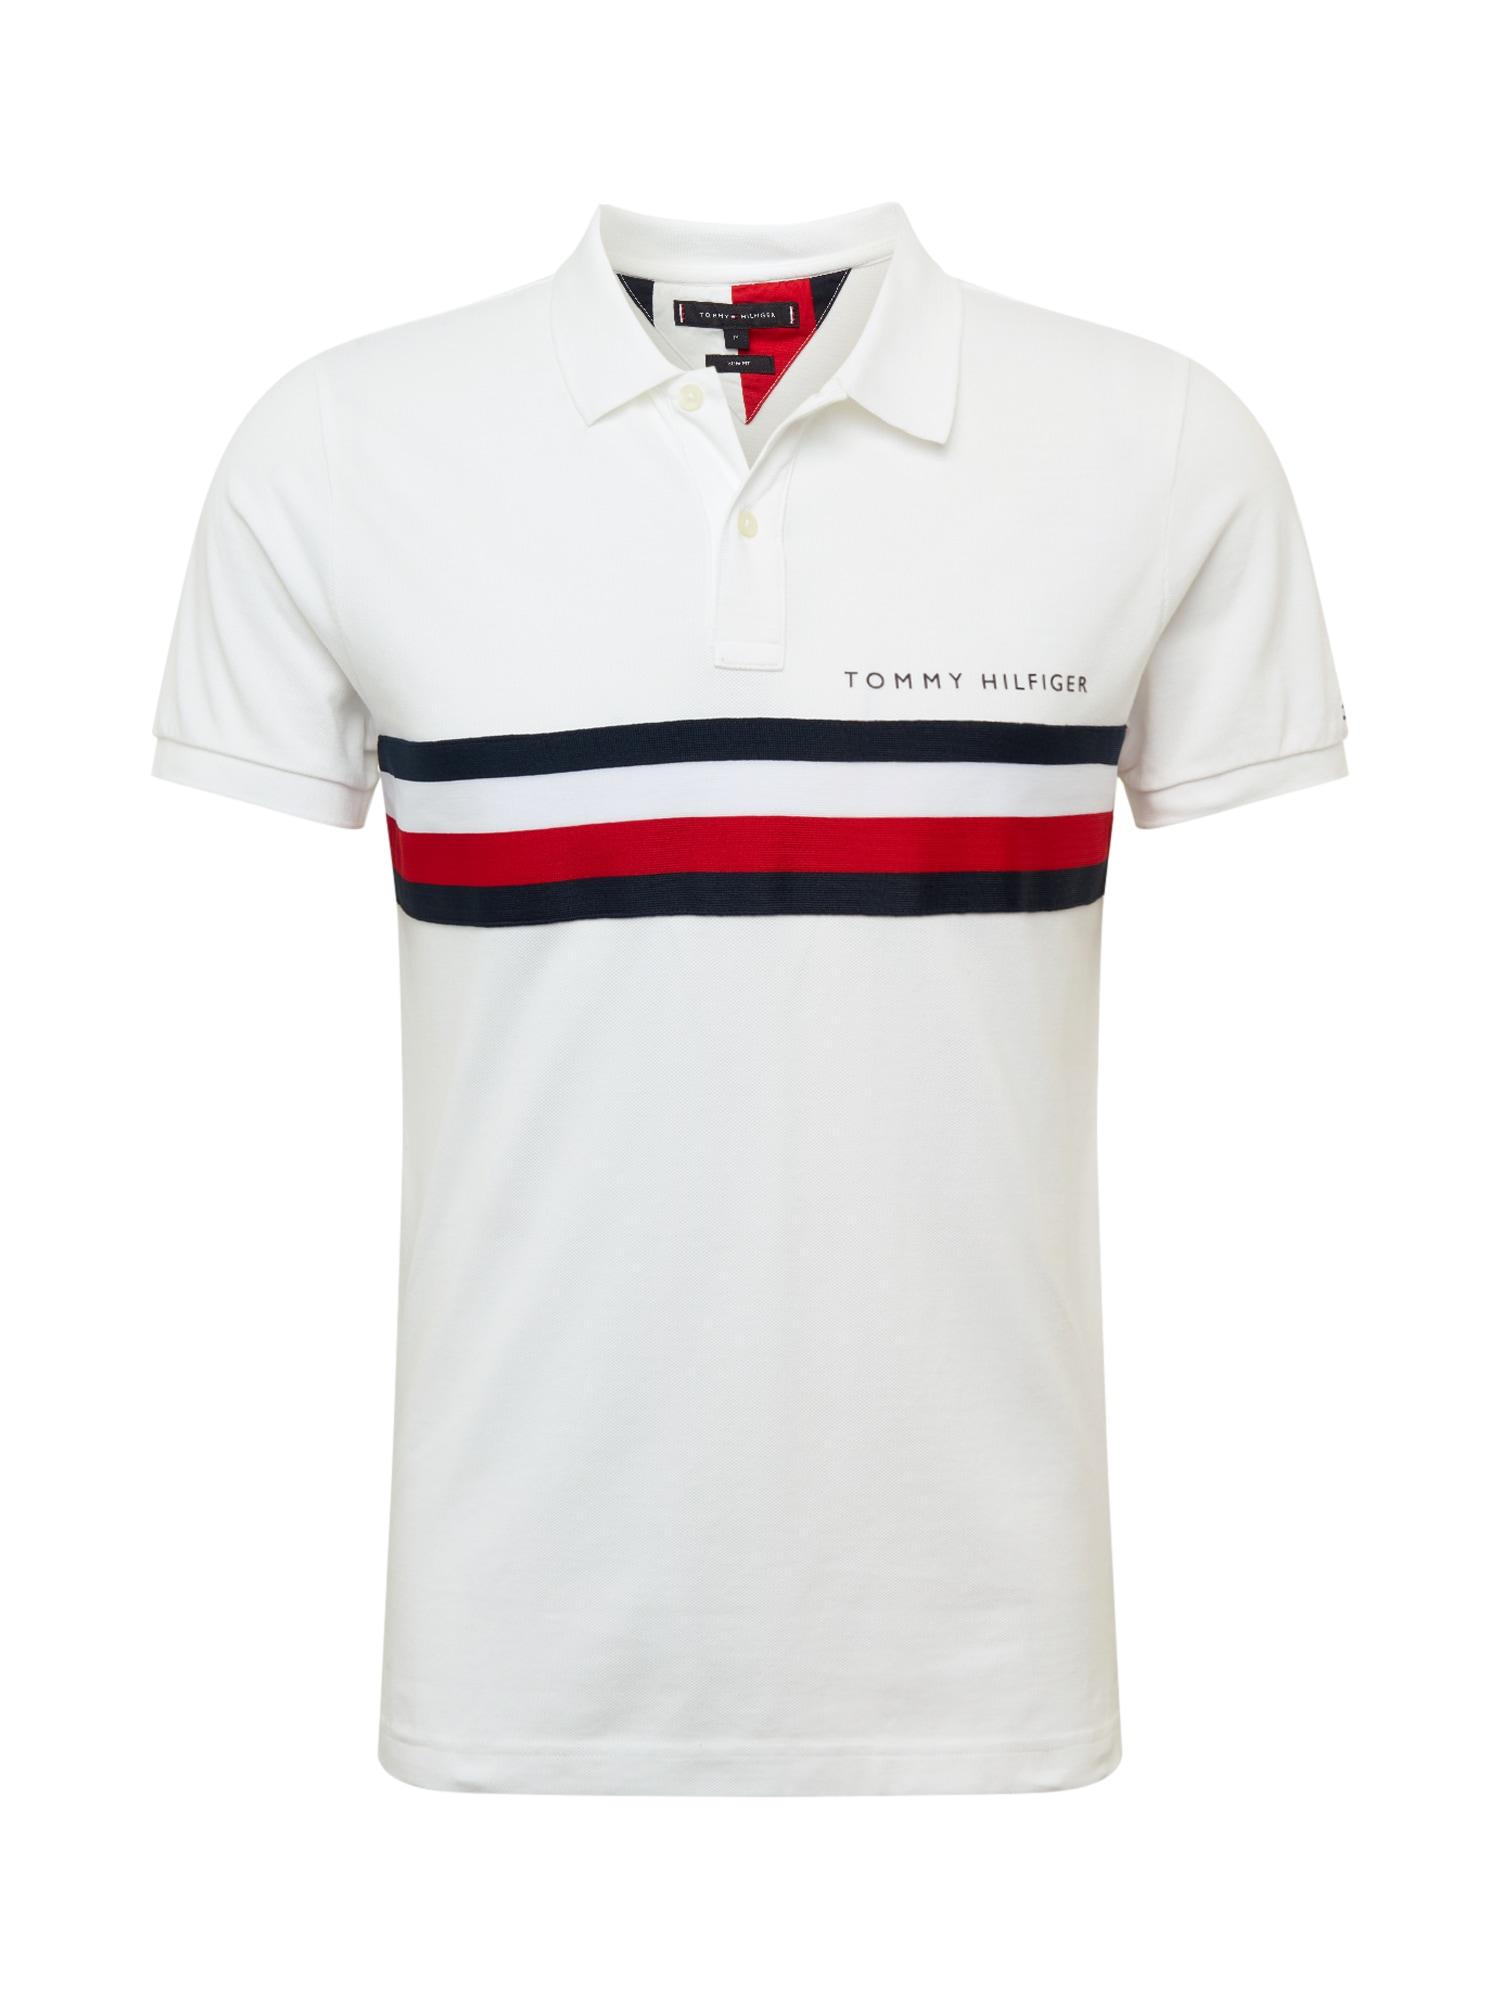 TOMMY HILFIGER Tričko  biela / námornícka modrá / červené